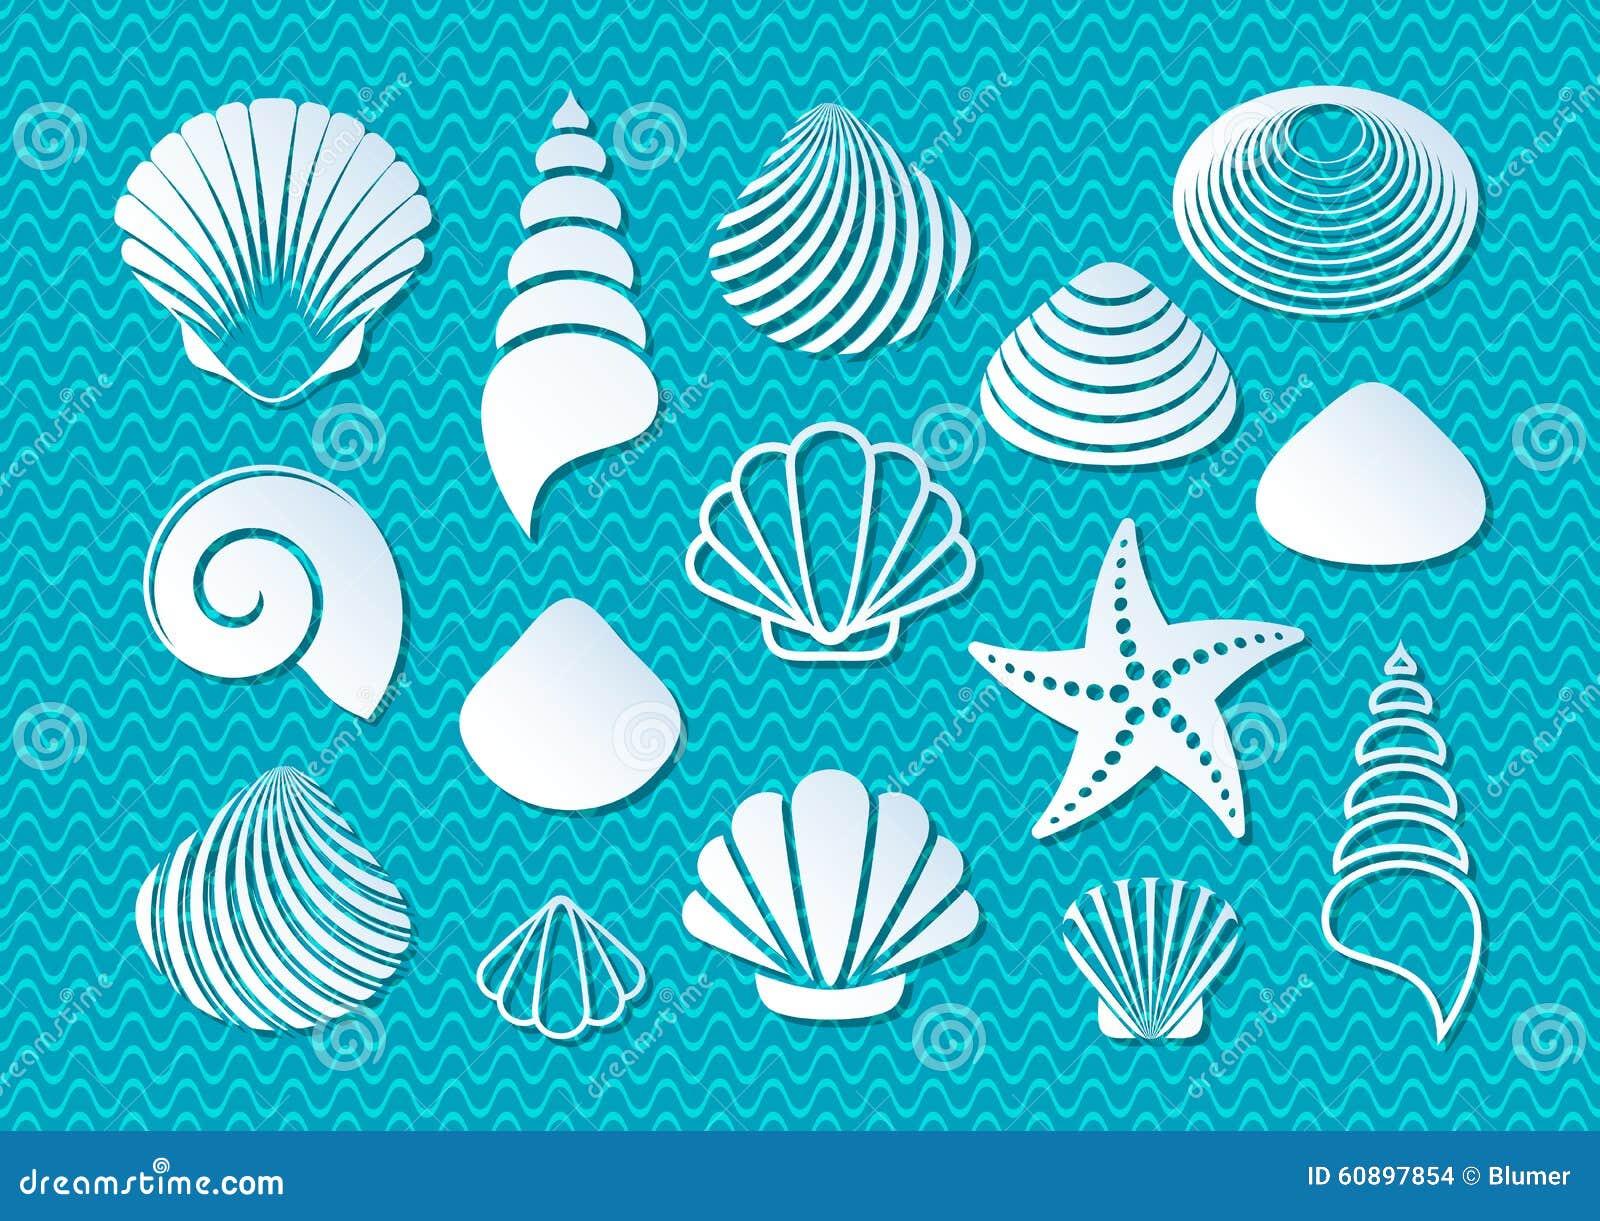 White sea shells icons